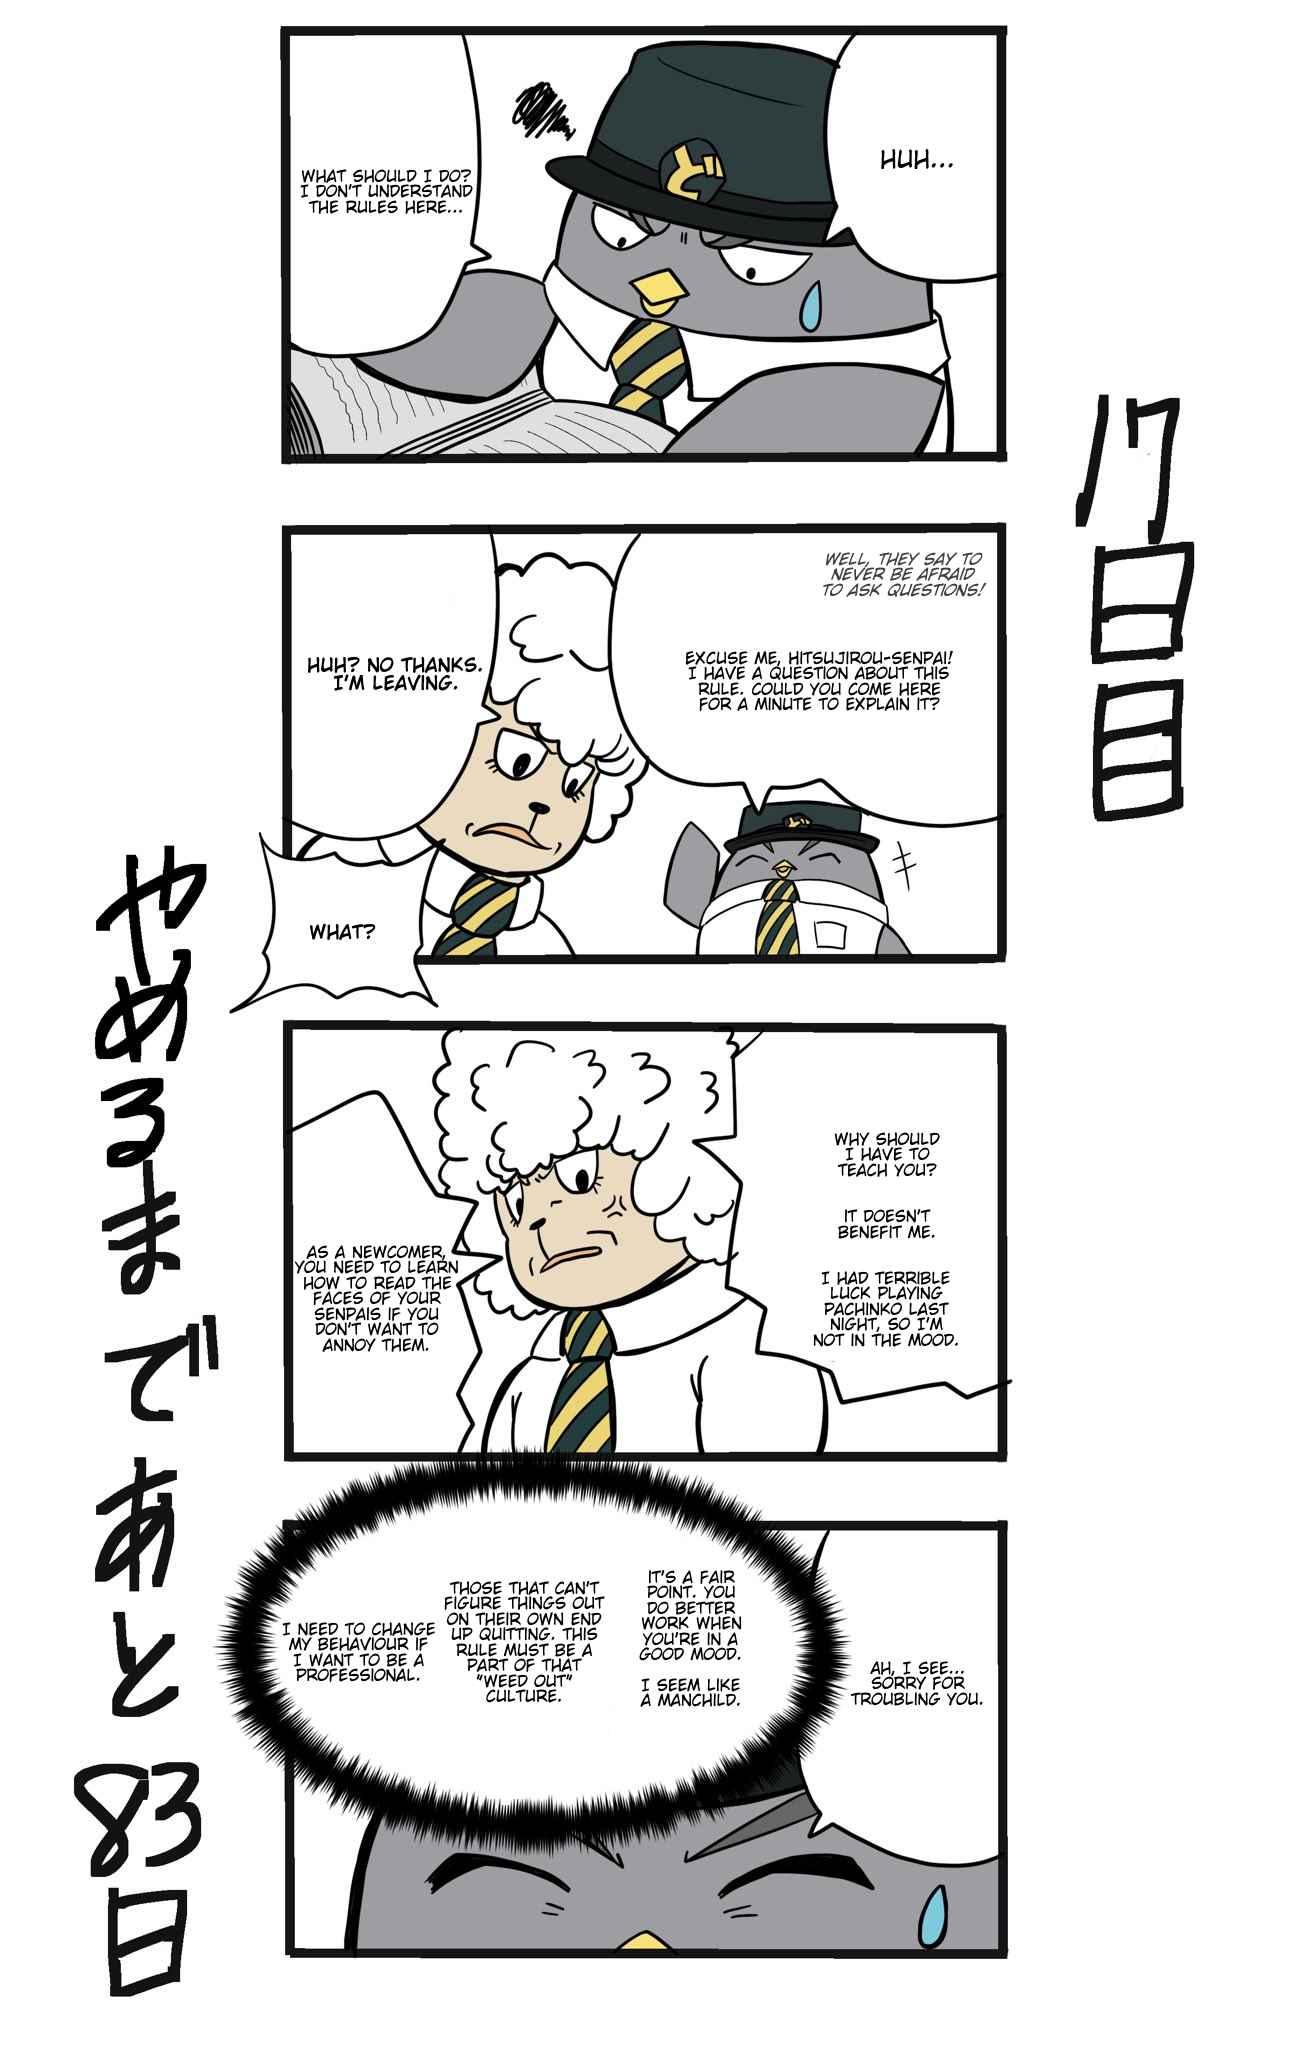 https://img2.nineanime.com/comics/pic4/11/40267/1939739/74d1f0ce6efe7118b786dc694997d658.jpg Page 1